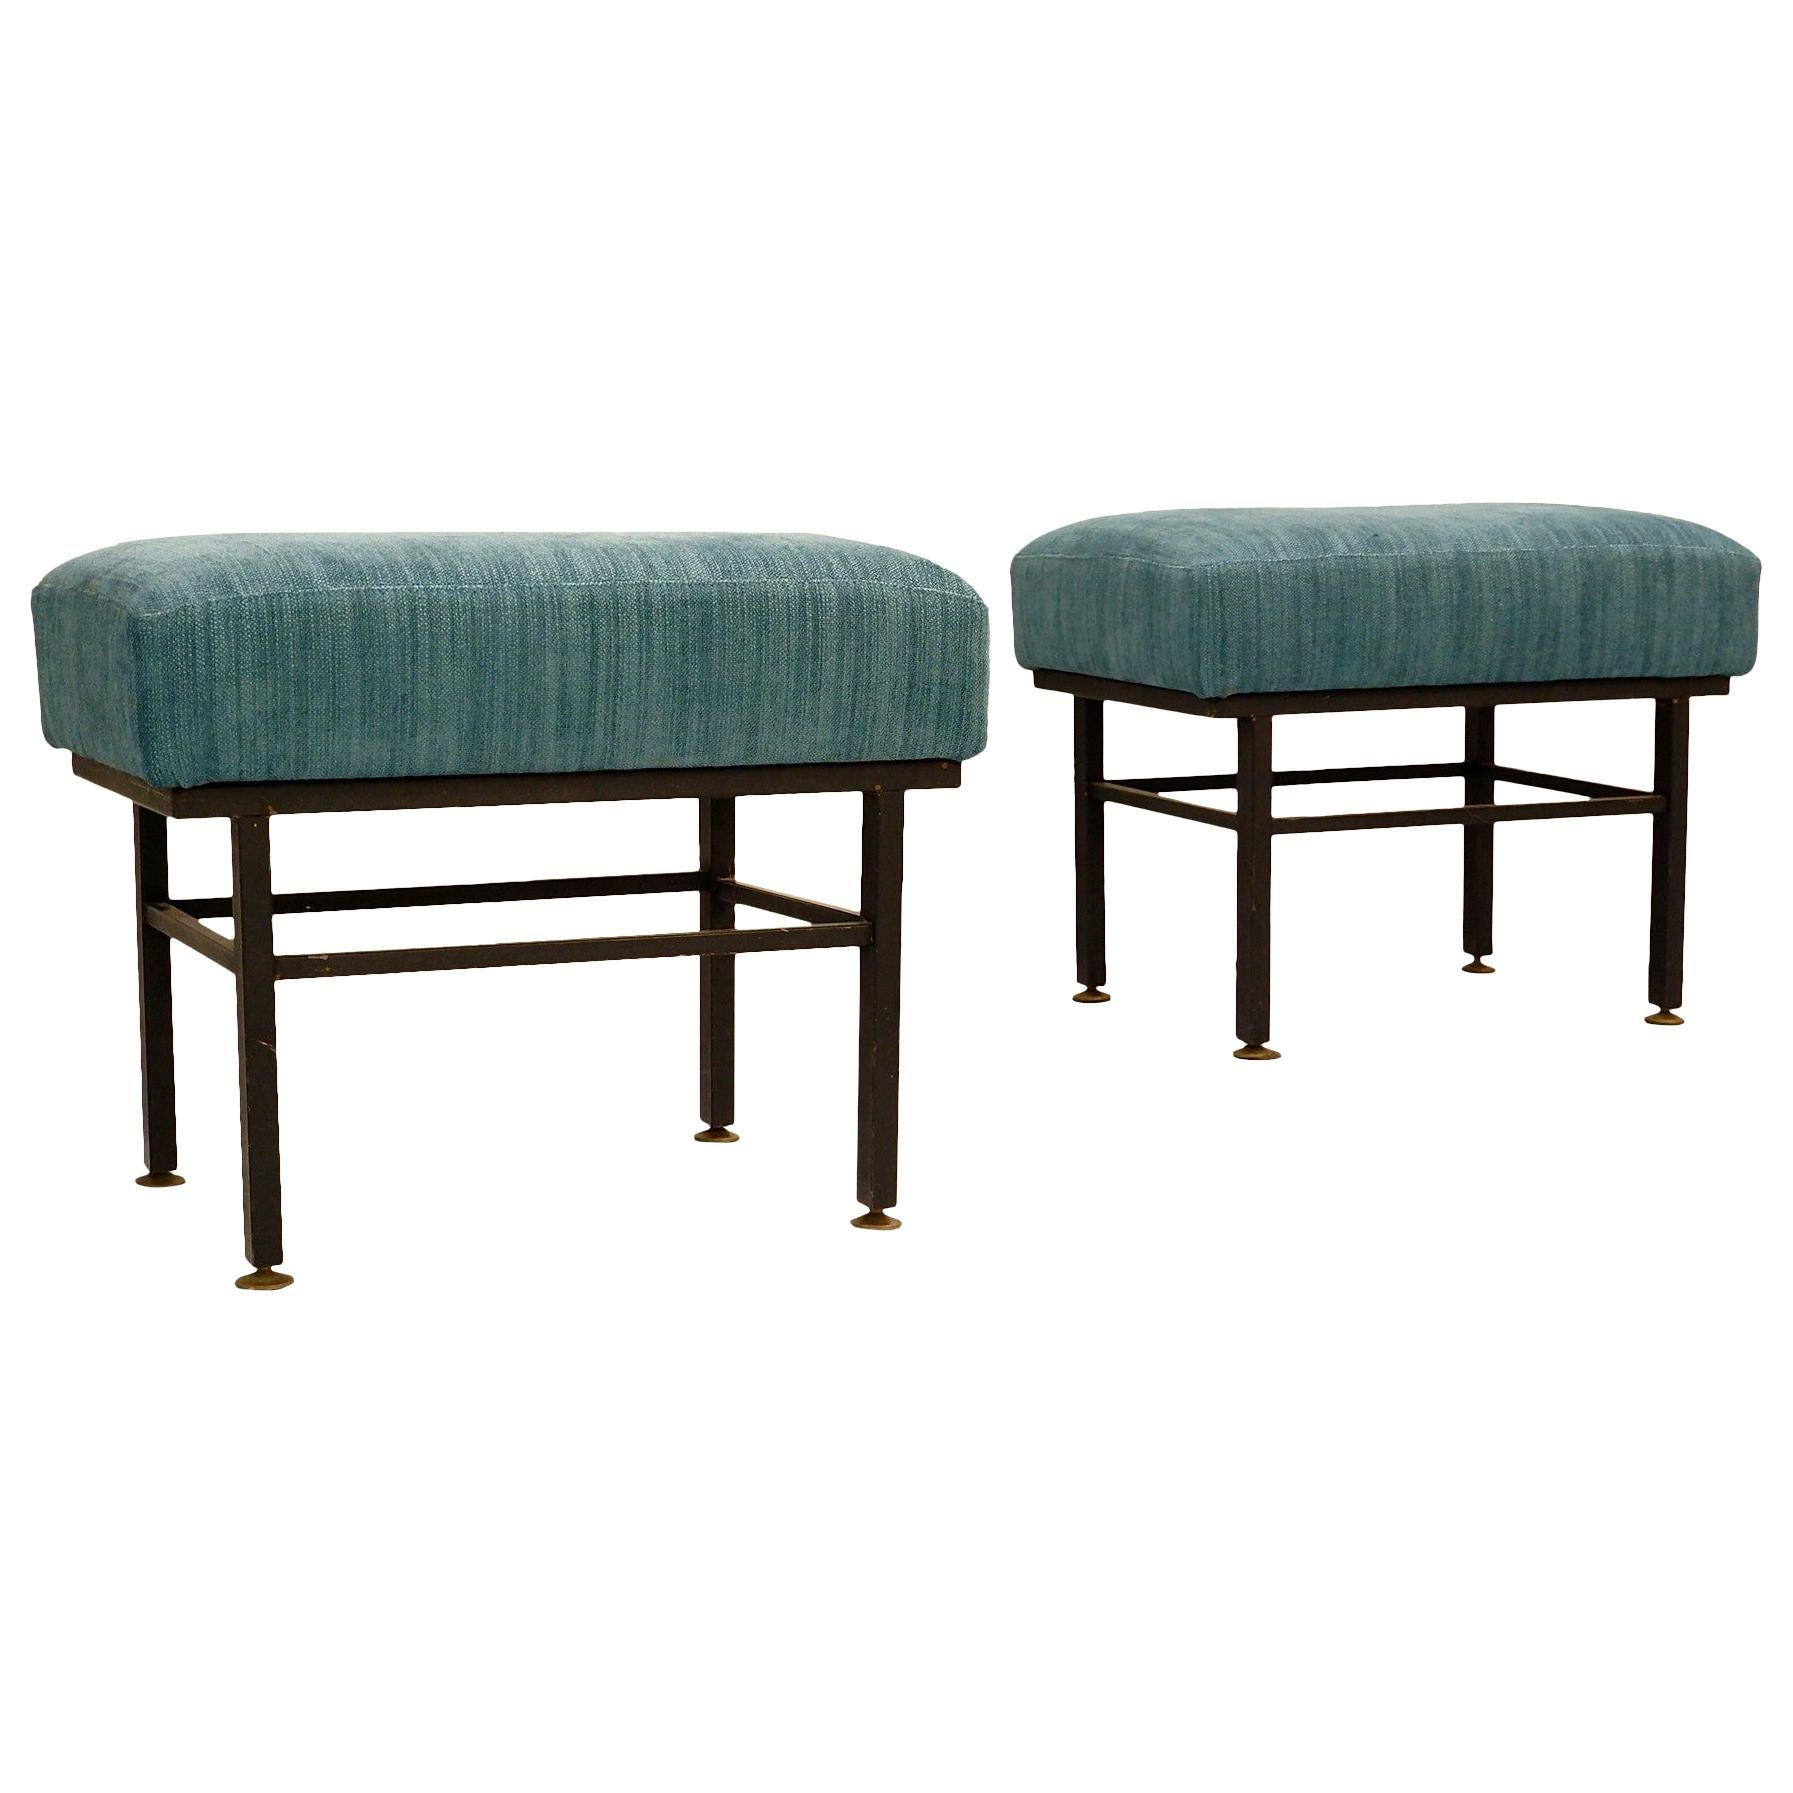 Pair of Italian Stools, New Upholstery